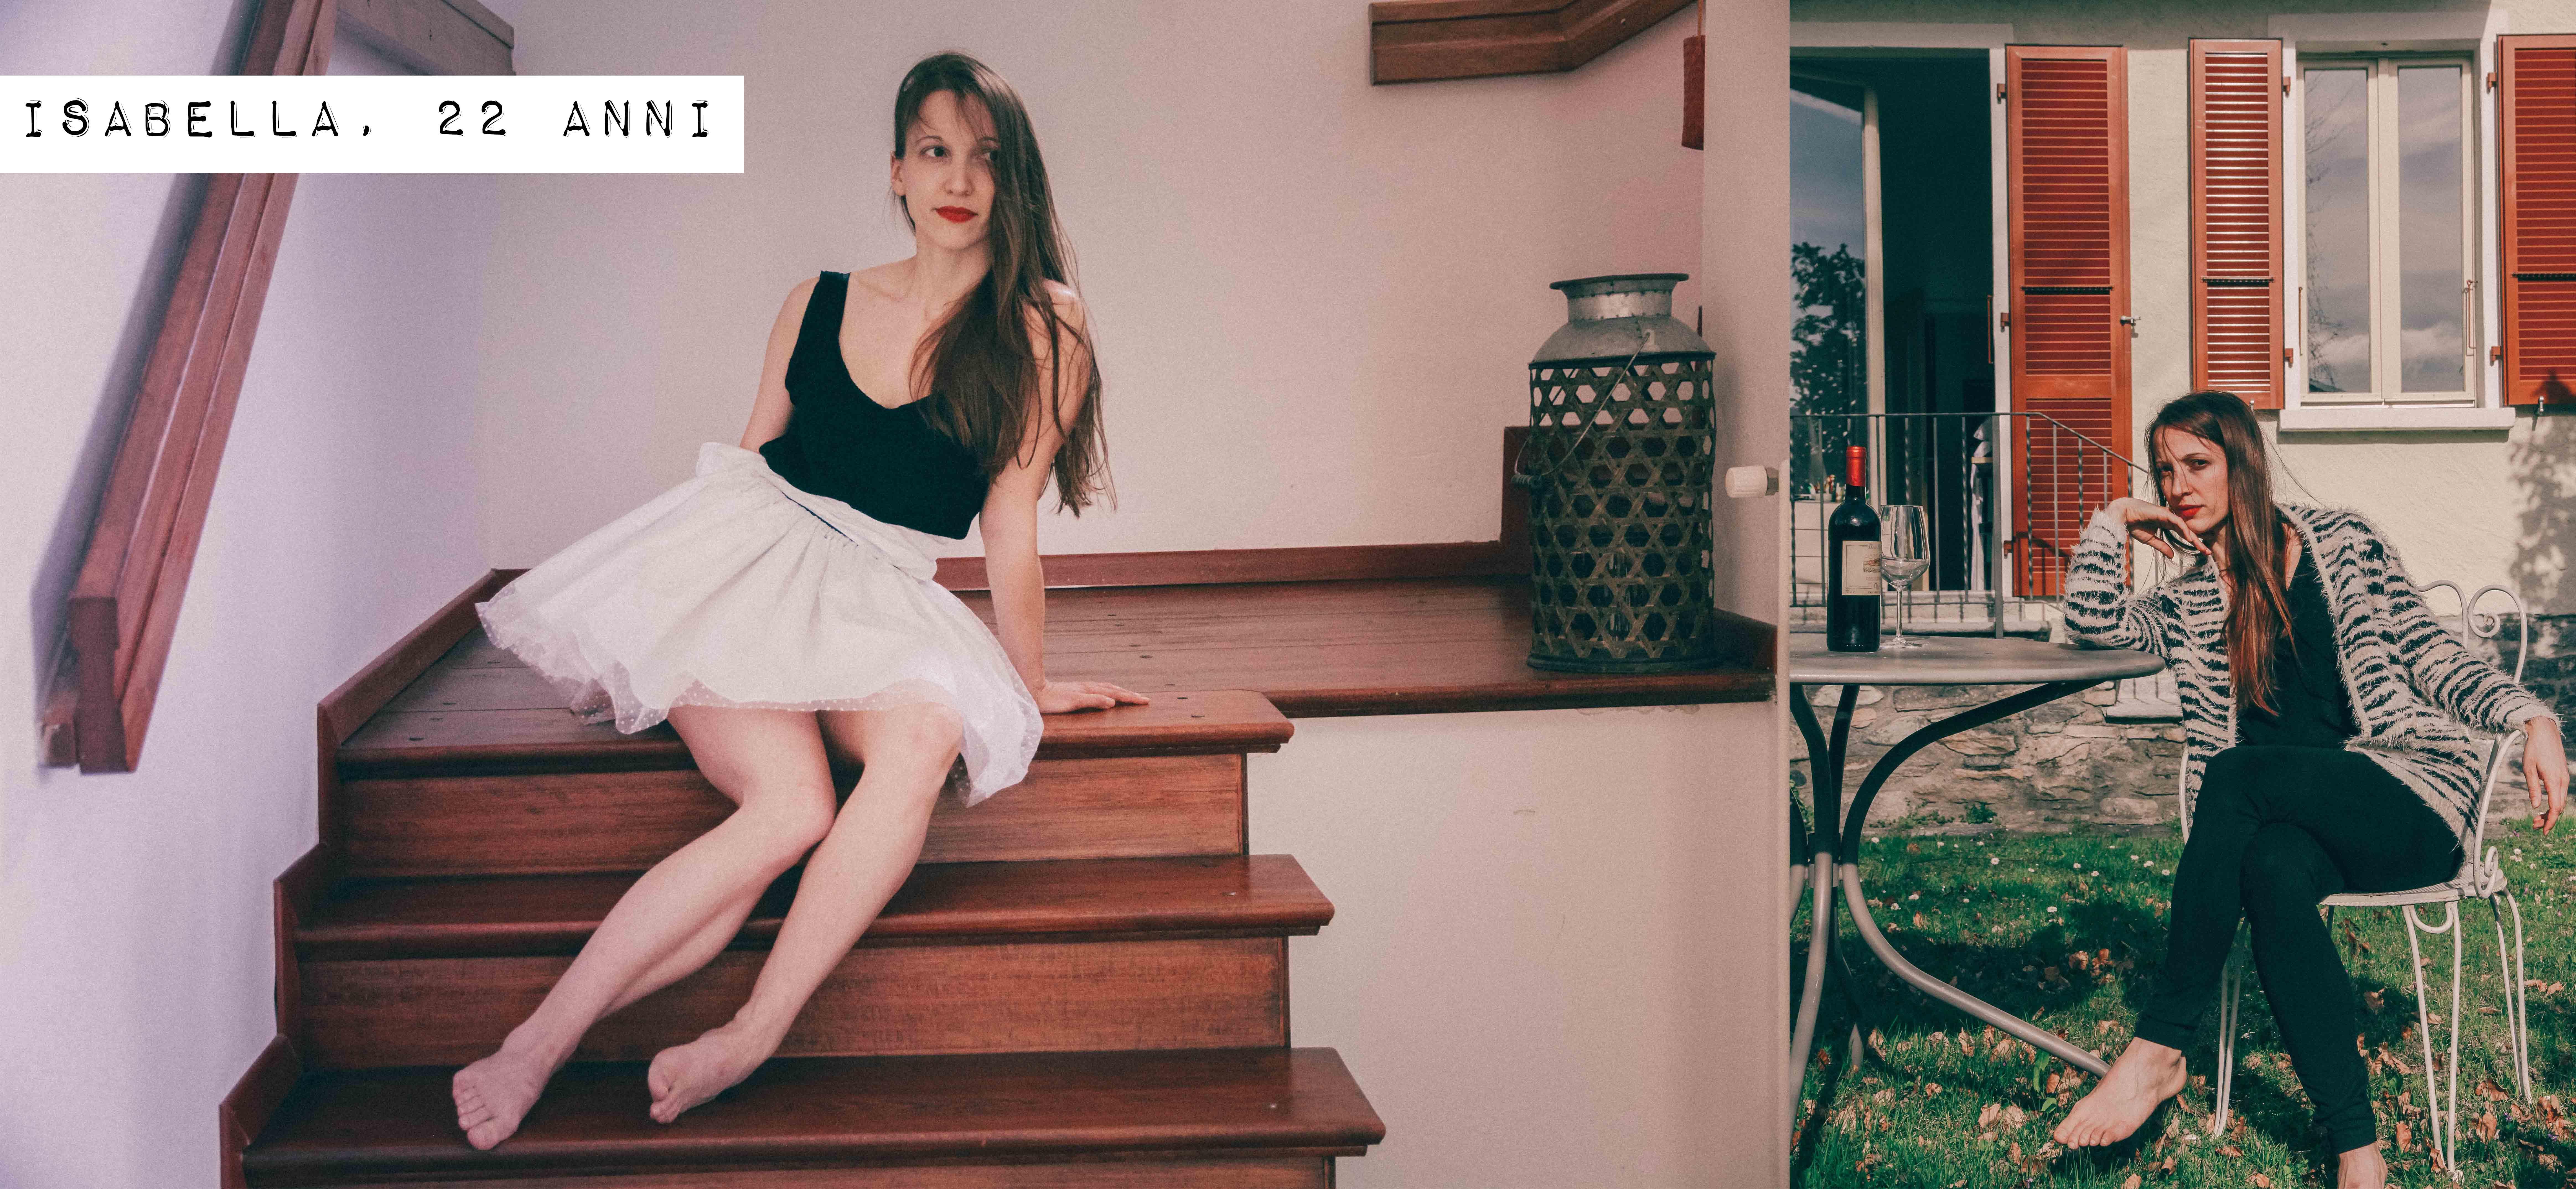 Isabella, 22 anni